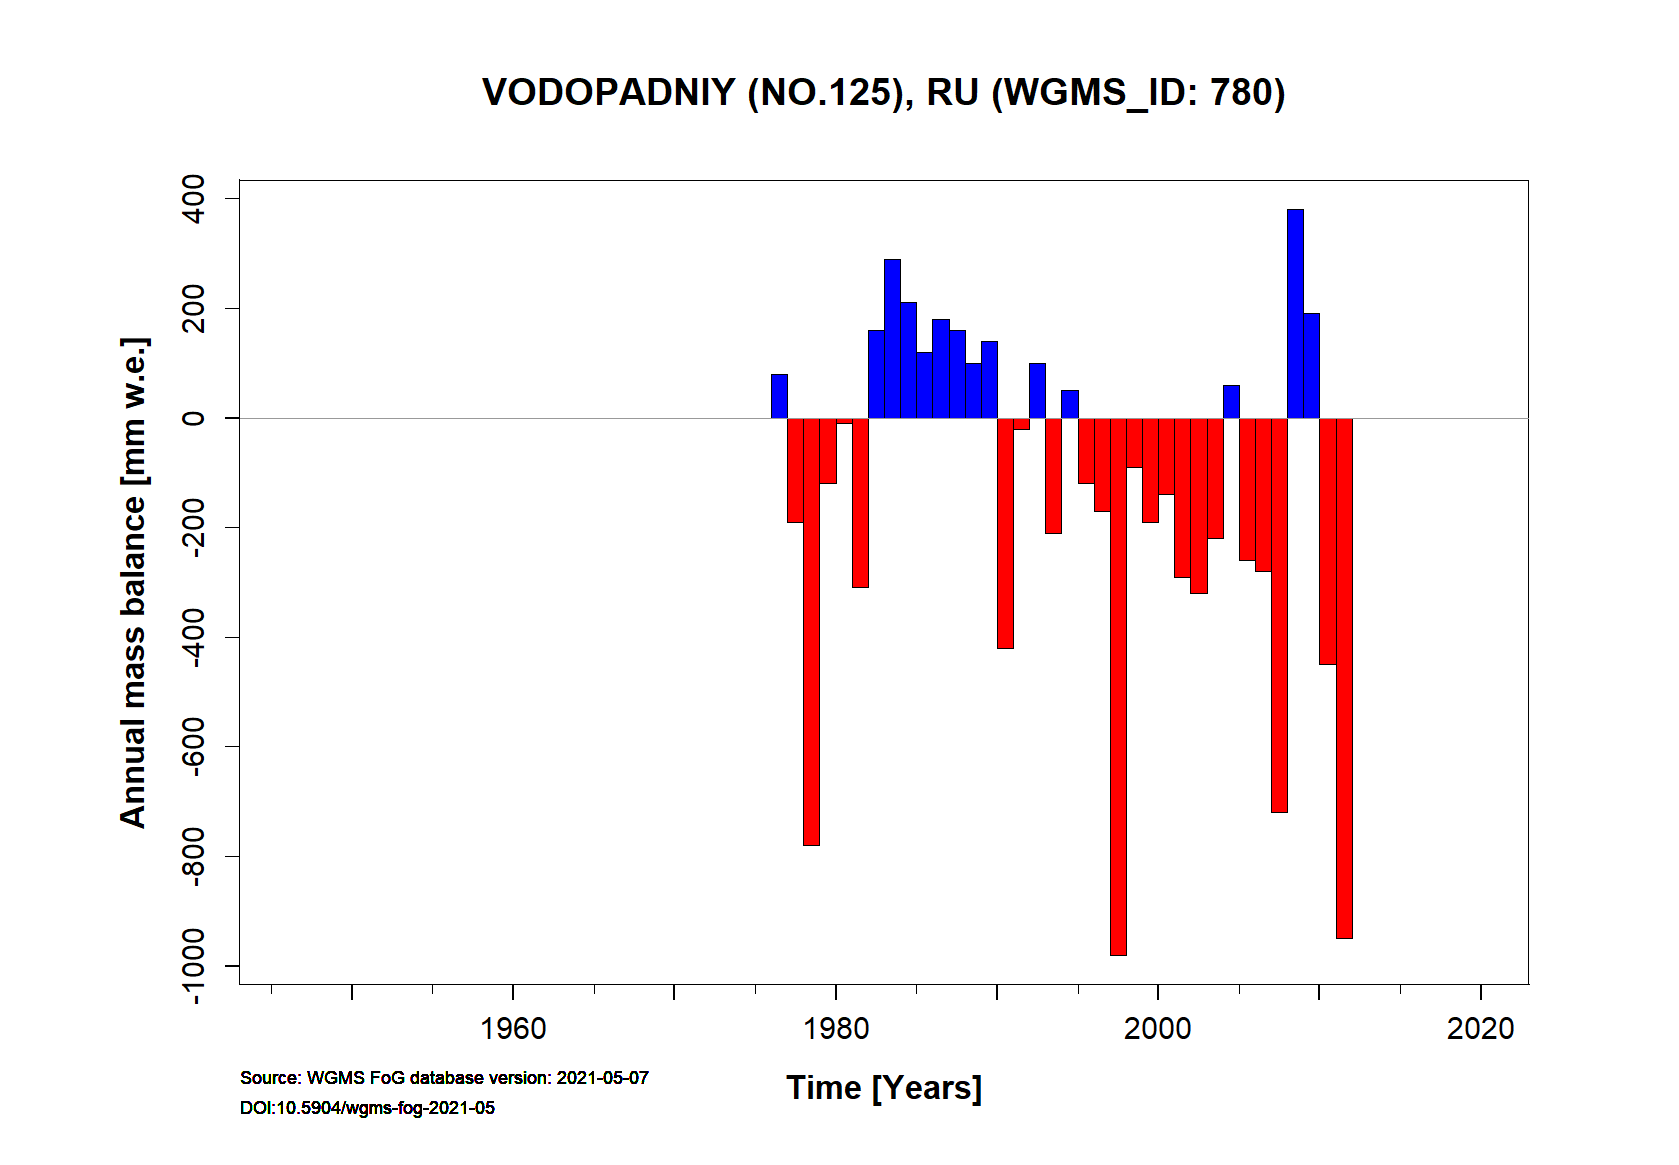 Vovopadniy (No. 125) glacier Annual Mass Balance (WGMS, 2016)